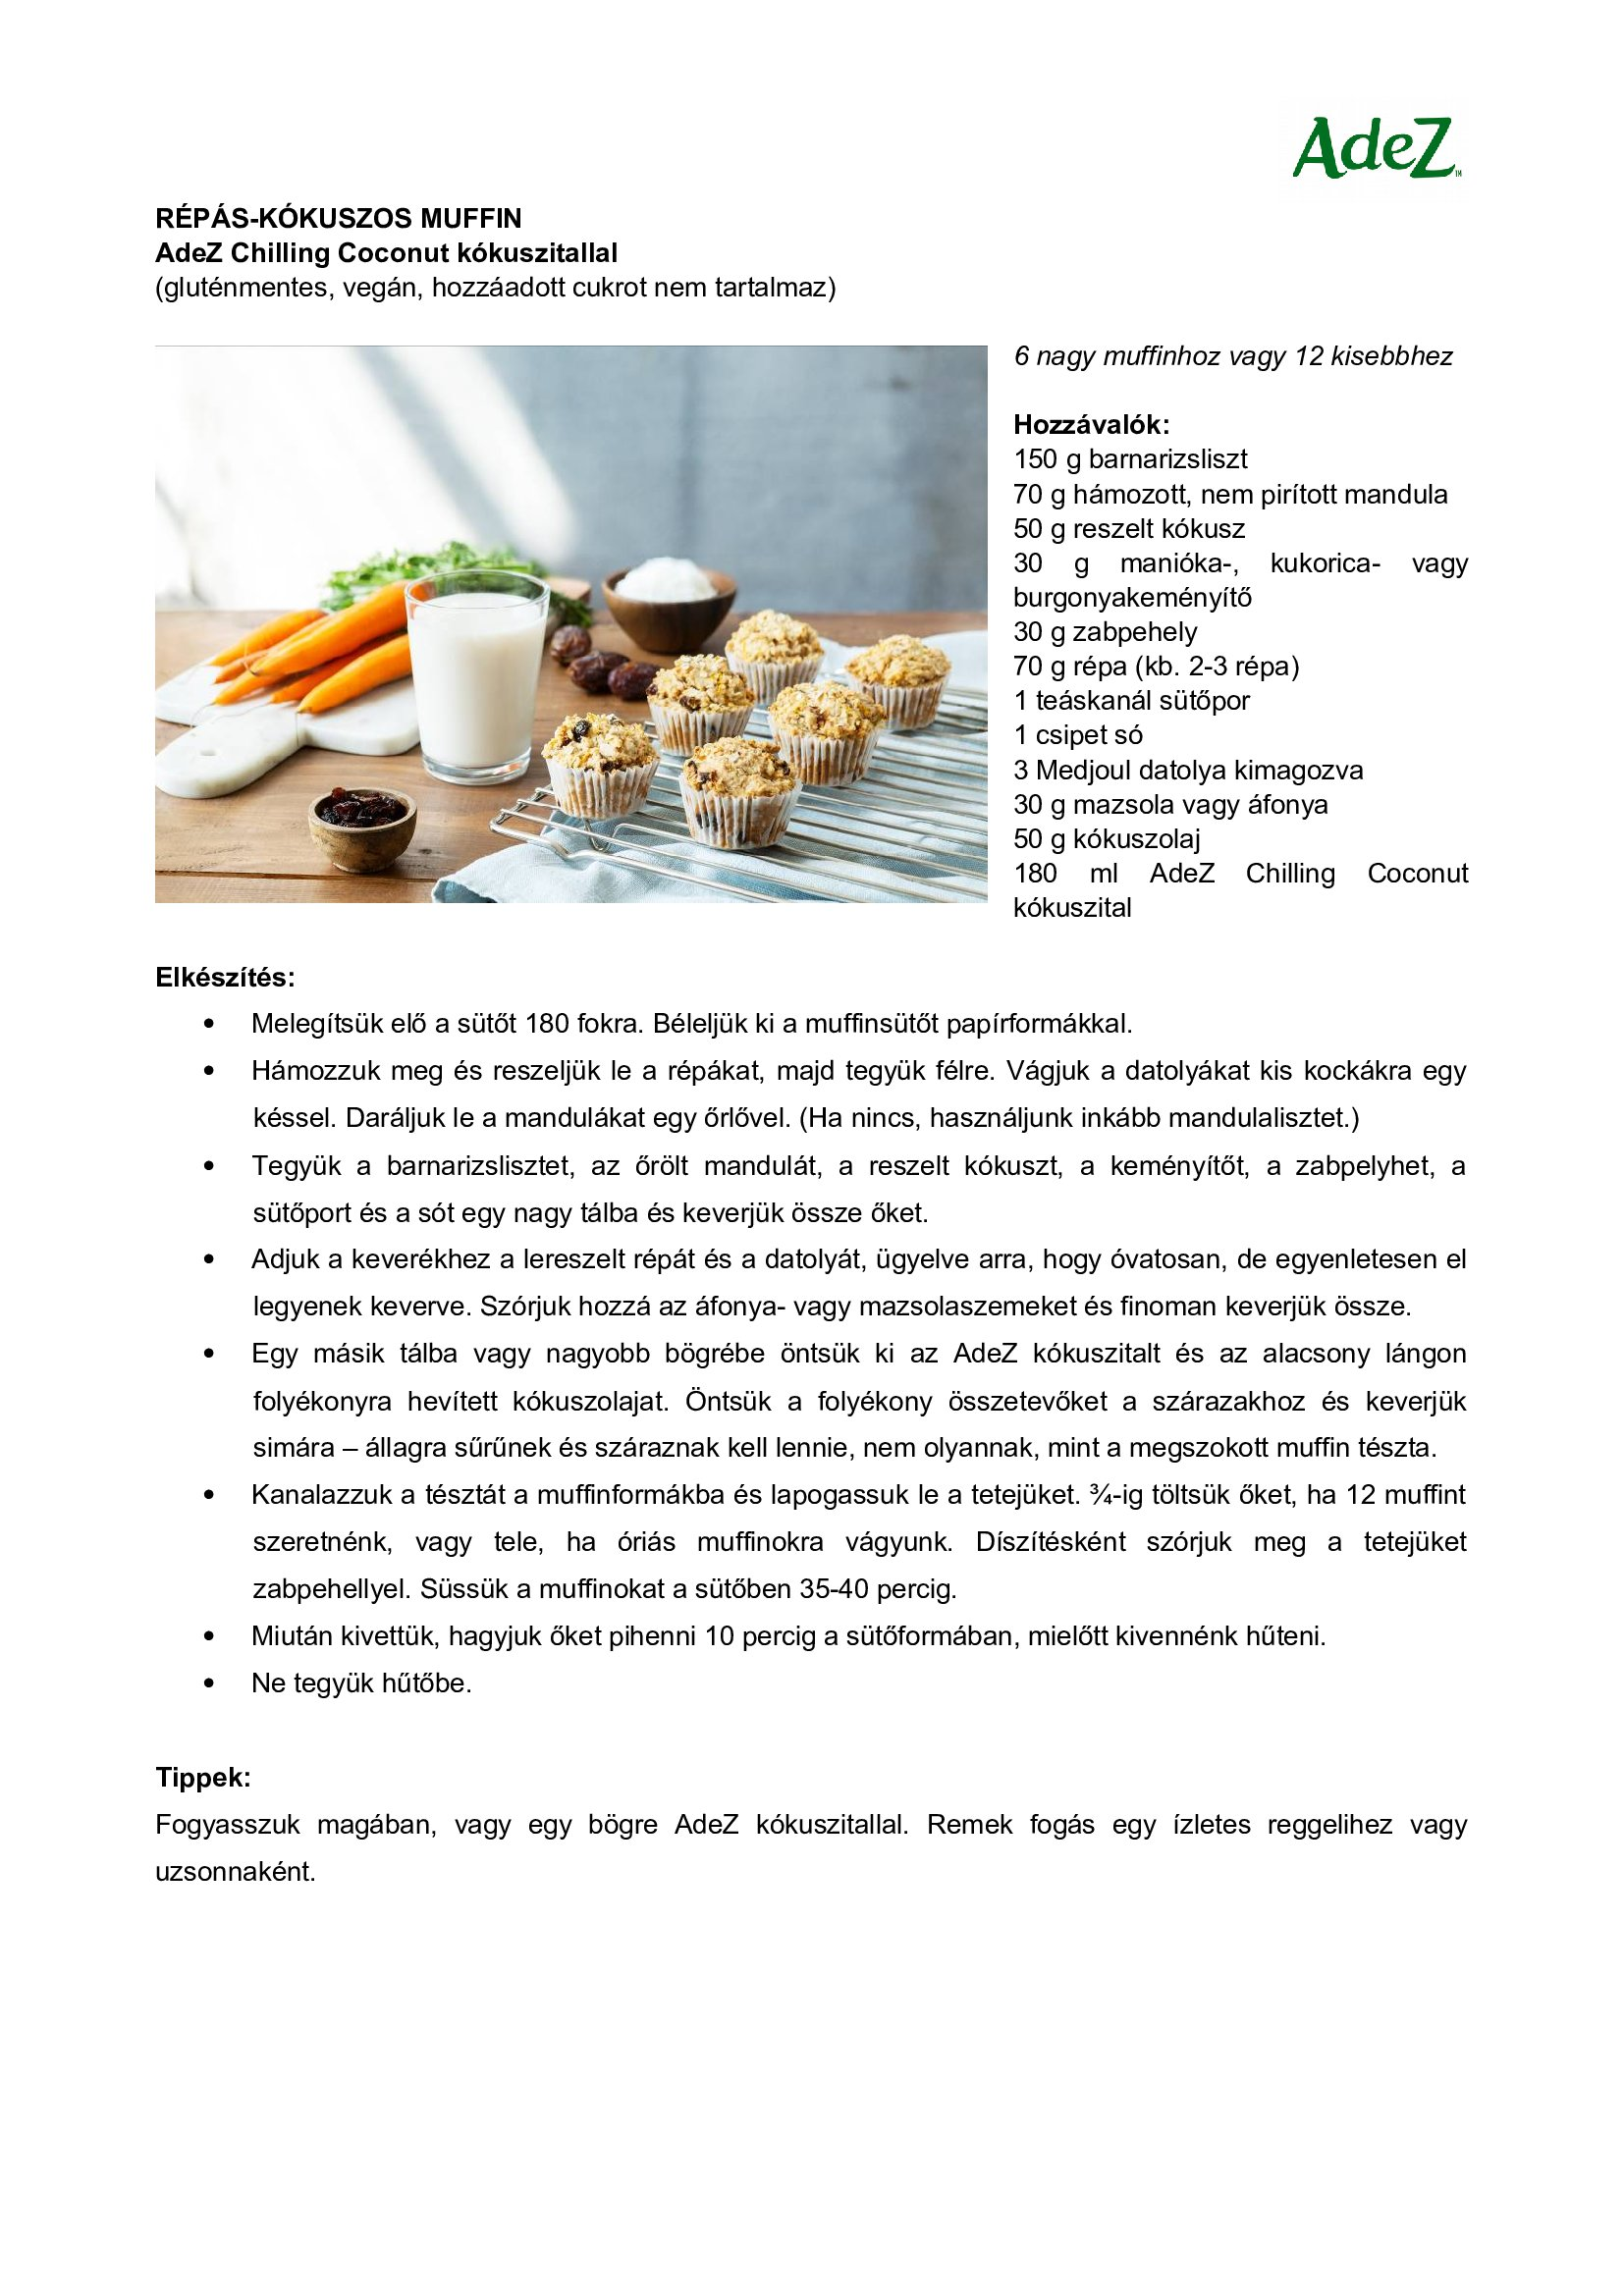 adez_ban_nkeny_r_muffin_smoothie_receptek_001.jpg